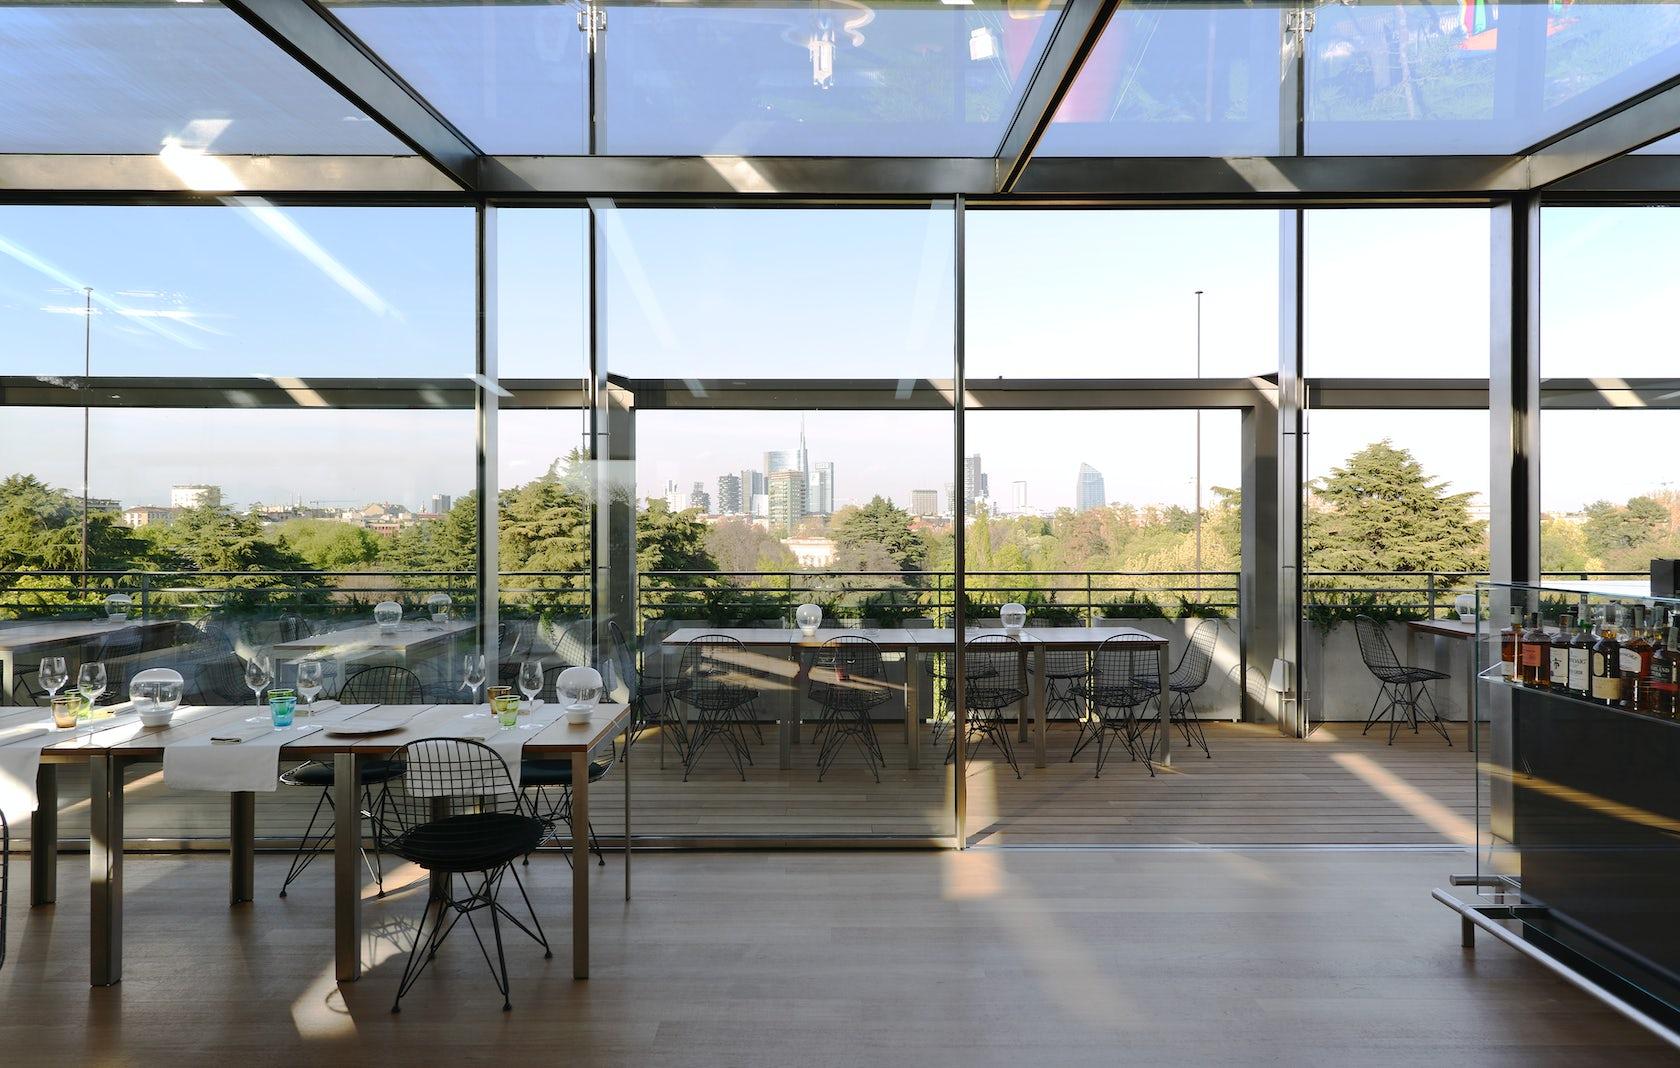 Terrazza Triennale On Architizer